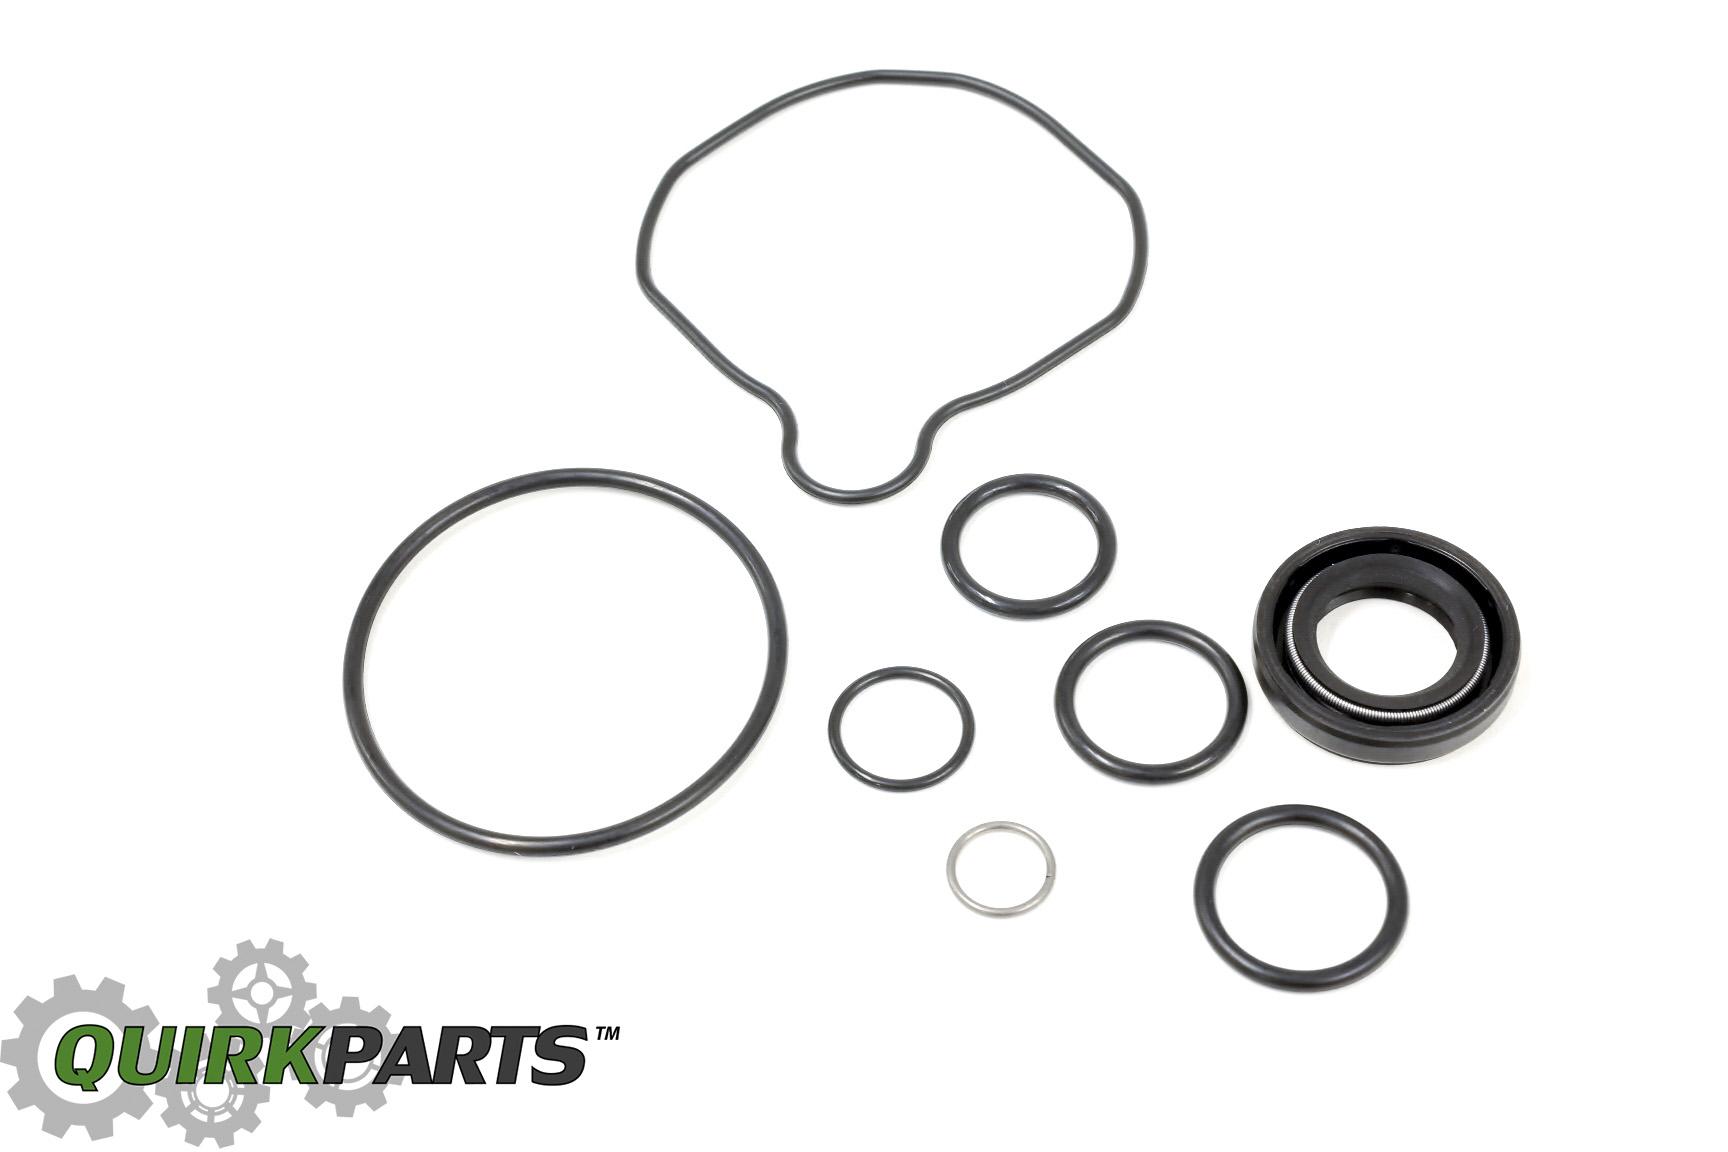 Mazda 3 6 CX-7 Power Steering Gasket Seal Kit OEM GJ6A-32